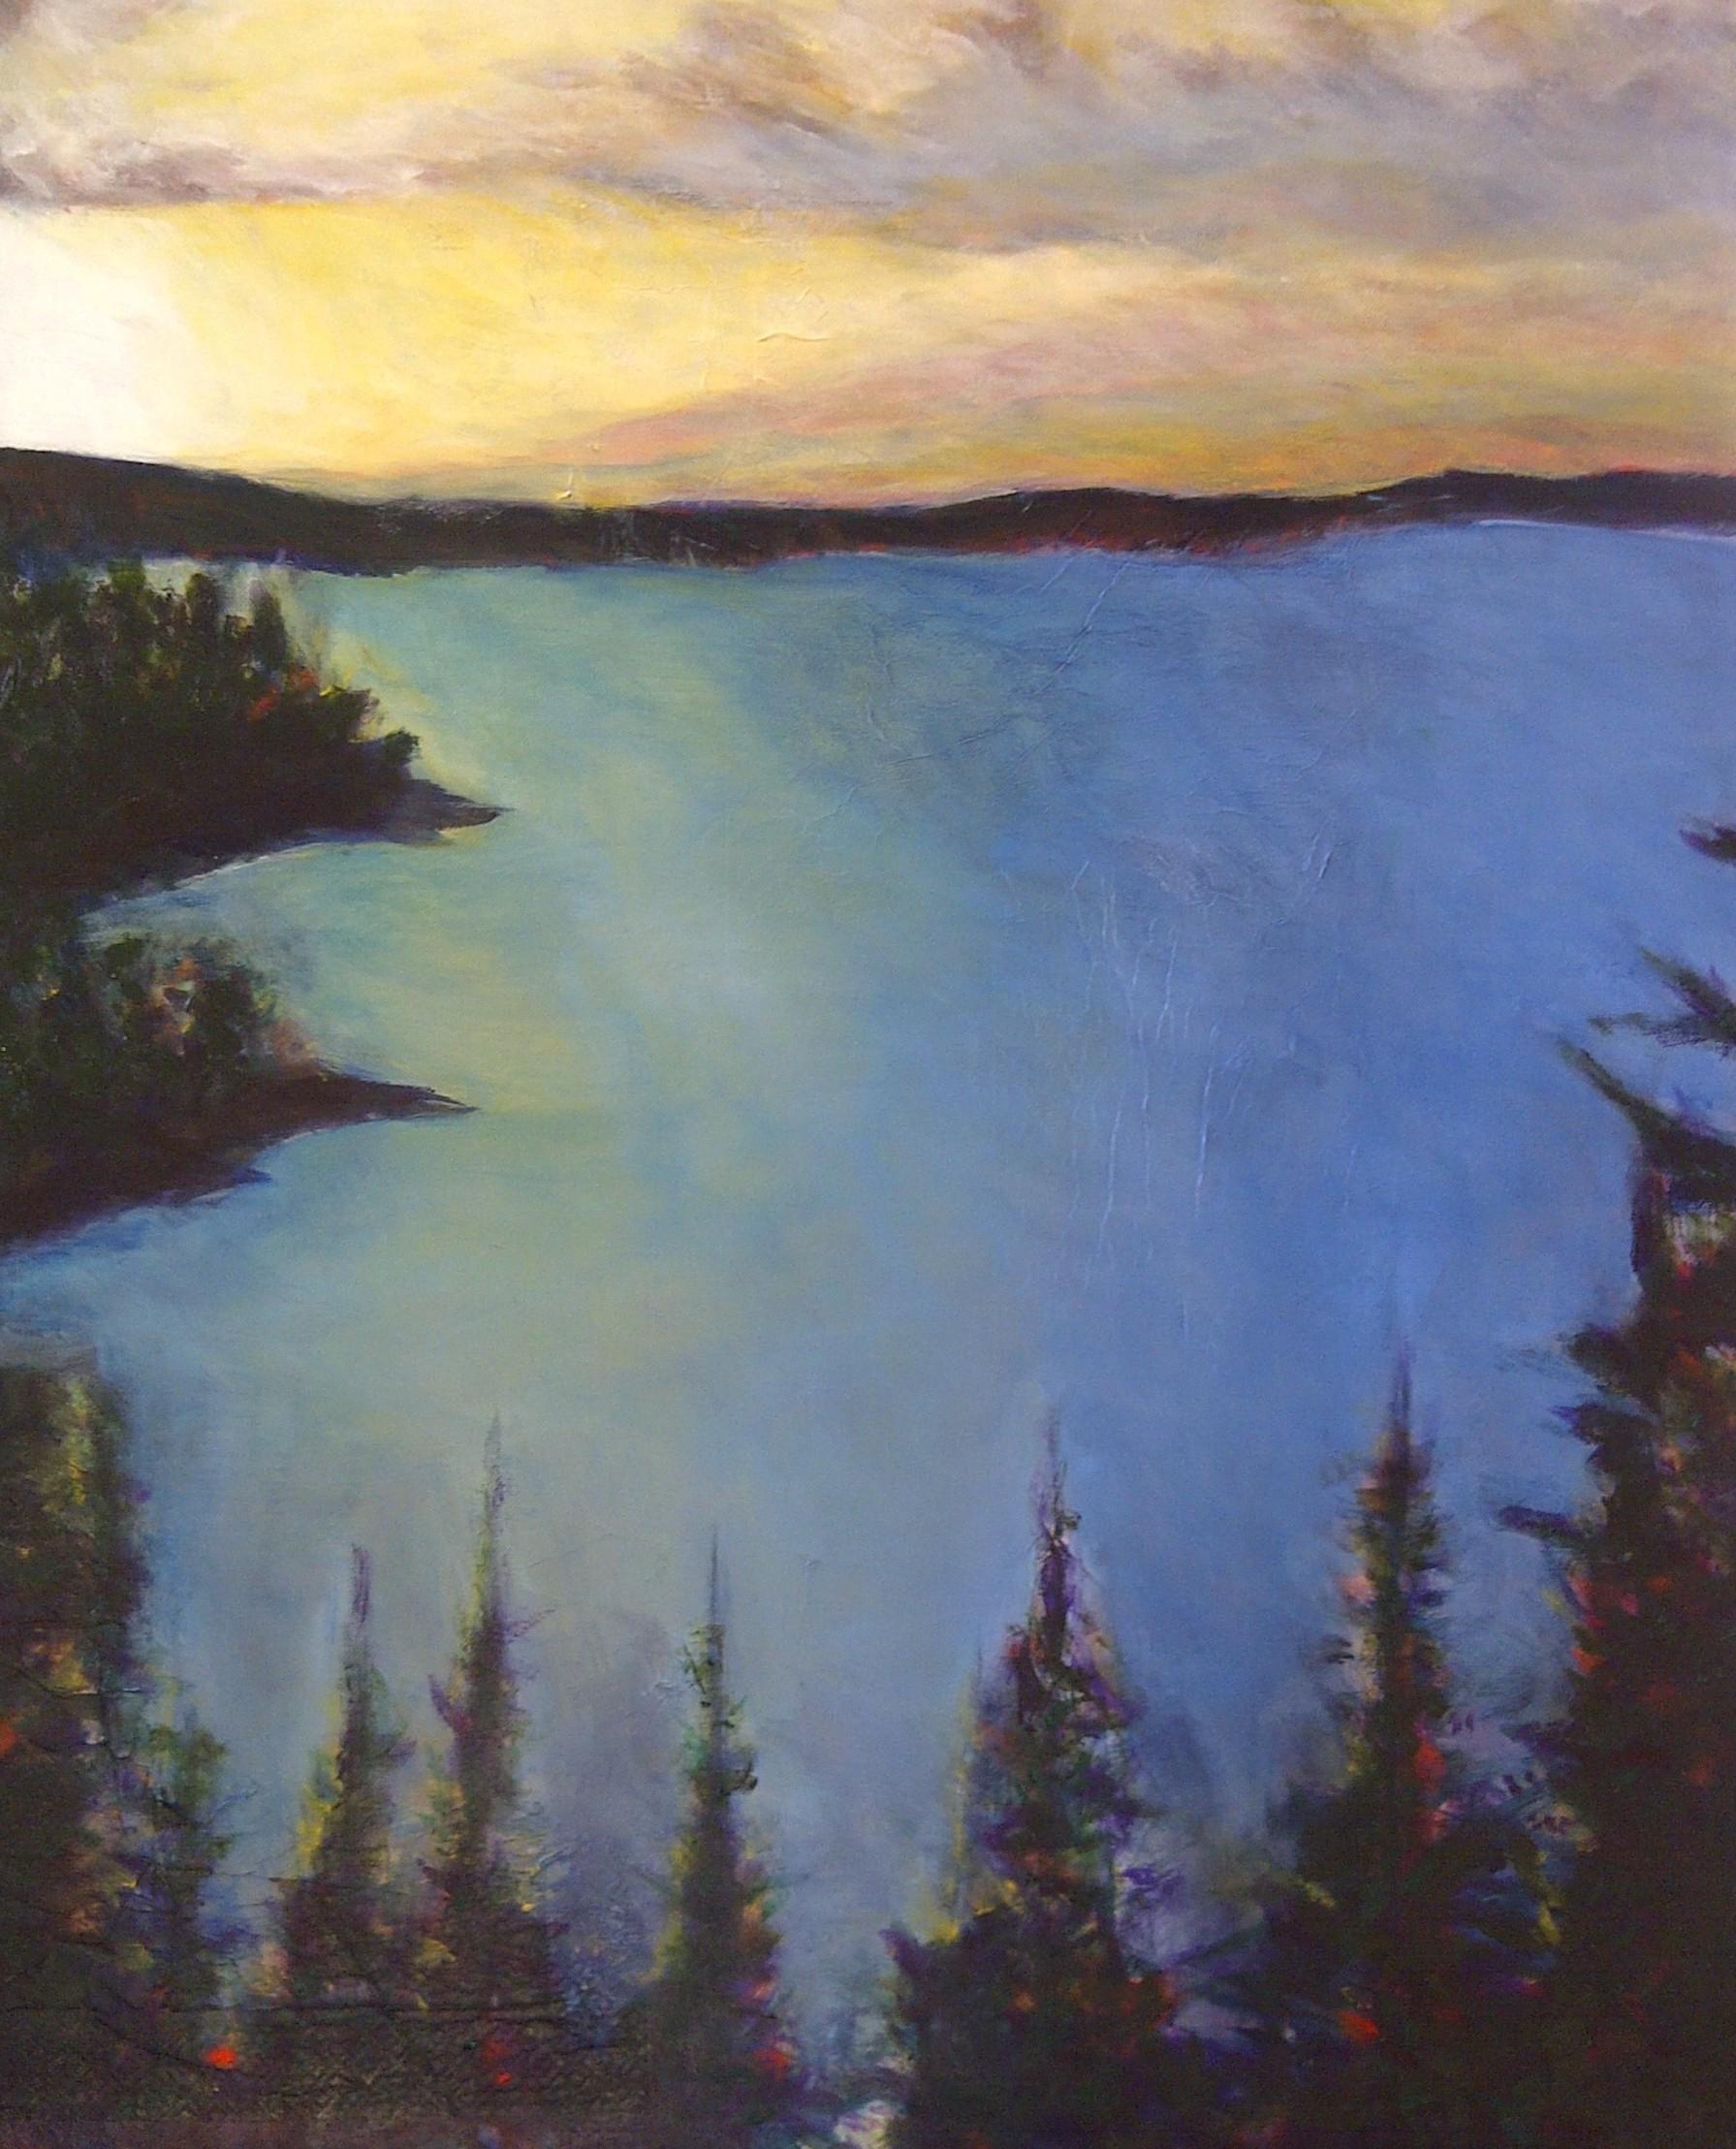 Lori's Lake